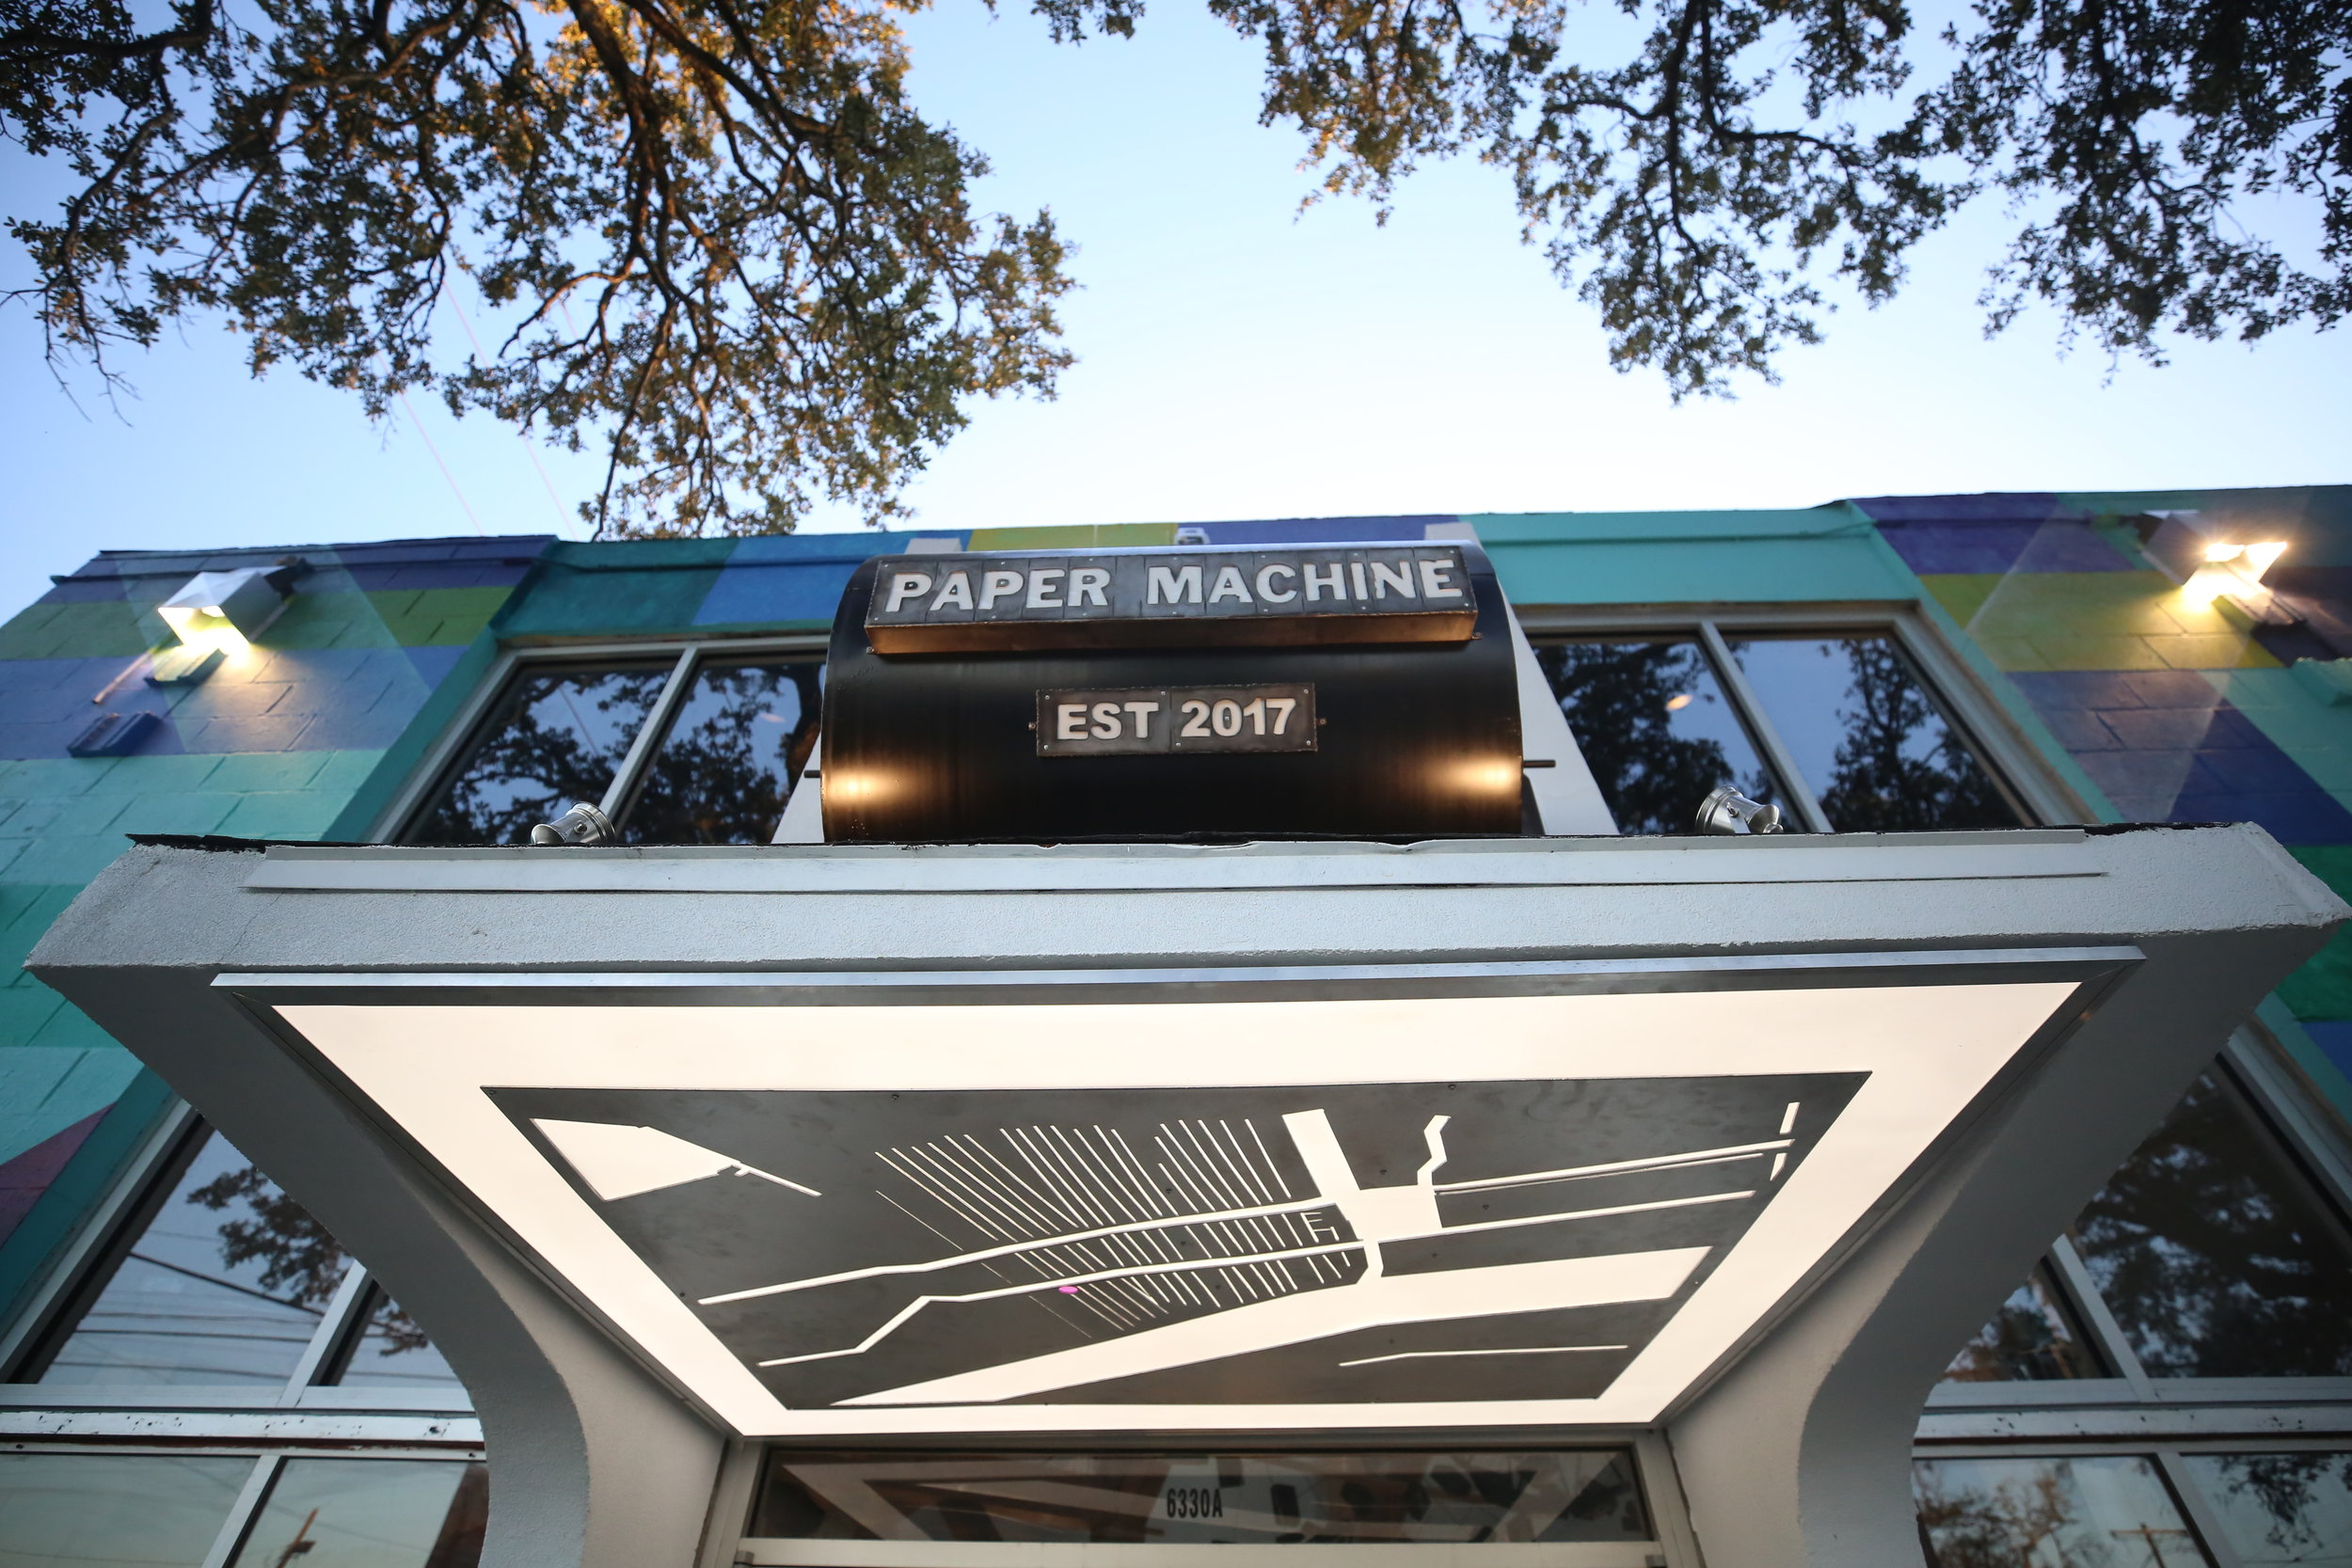 11-28-2017 Opening of Paper Machine 030 (1).jpeg